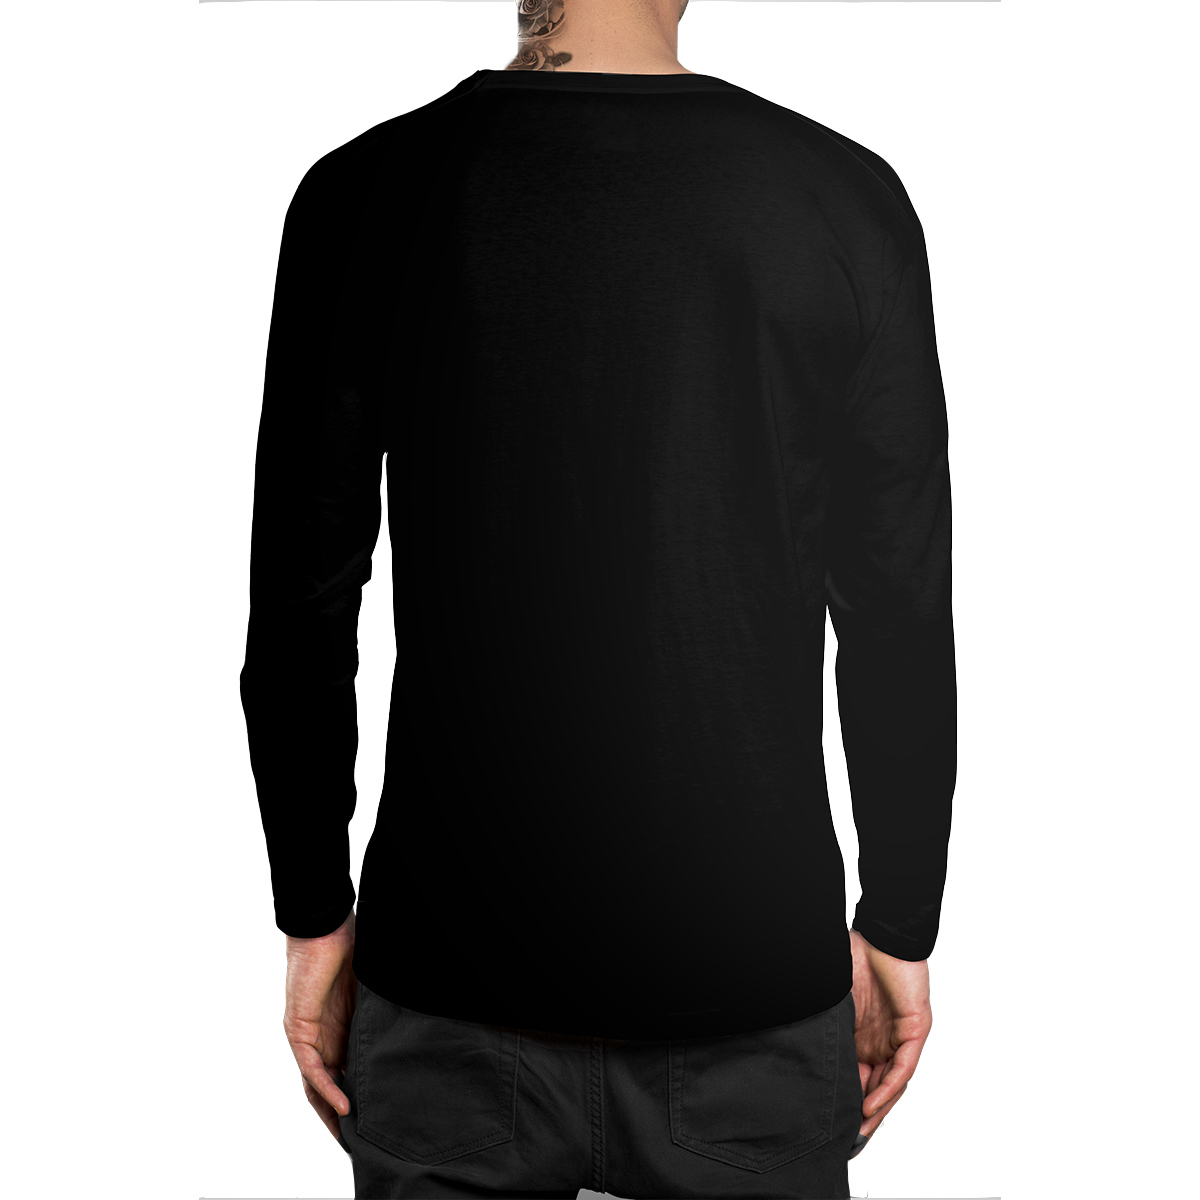 Stompy Camiseta Manga Longa Modelo 10